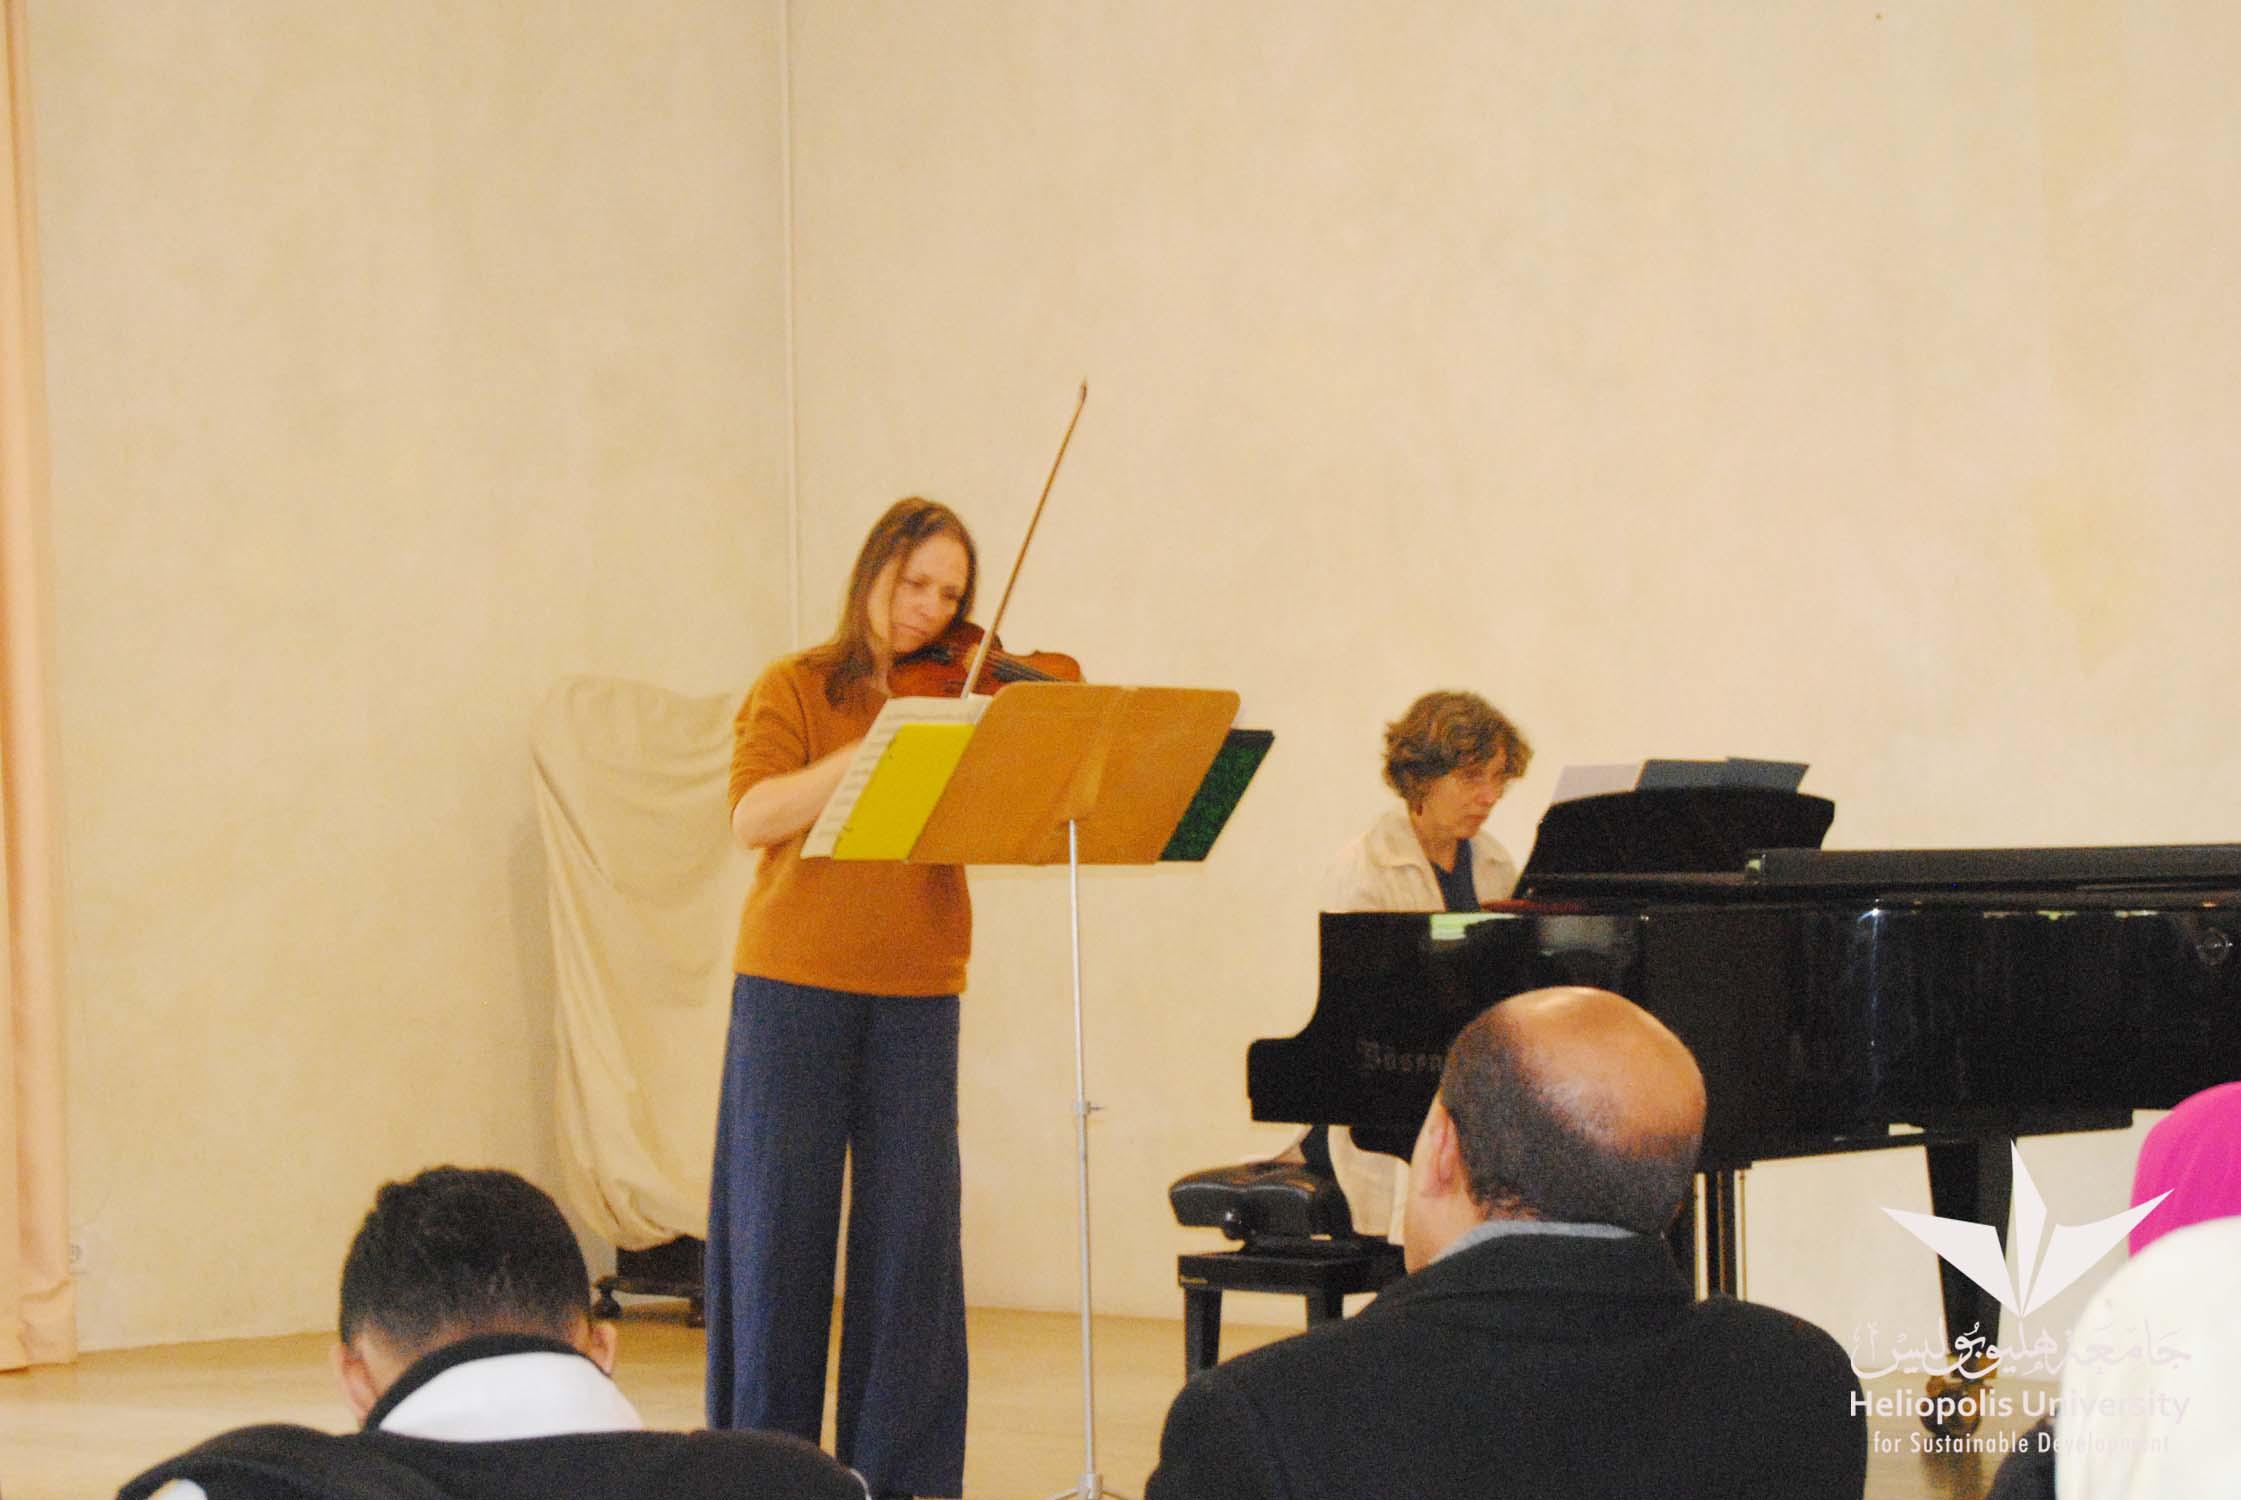 classical music violin of Astrid Abas and piano of Dorien Verheijden